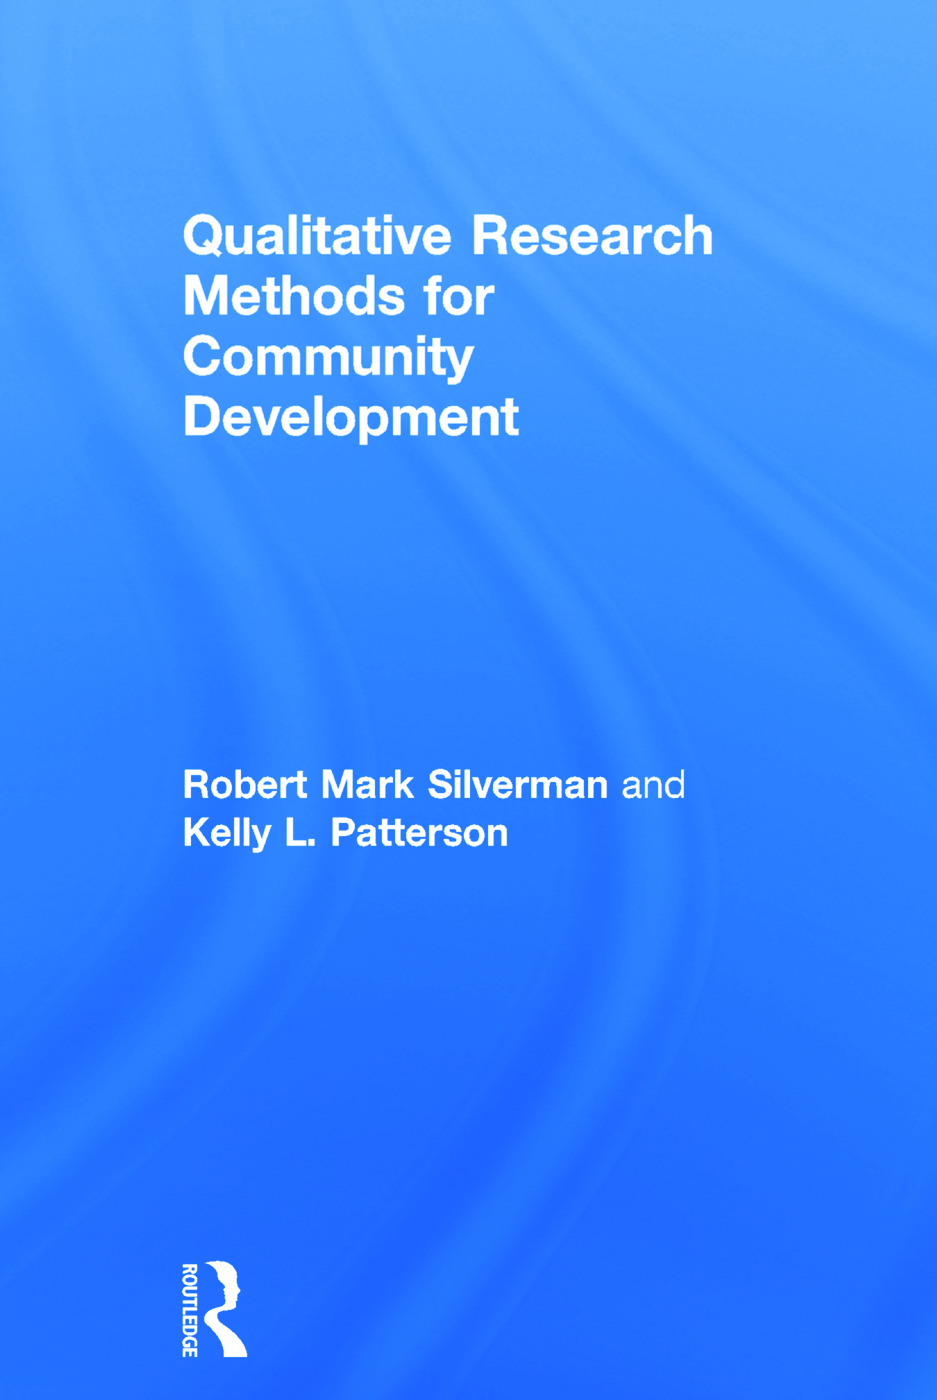 Qualitative Research Methods for Community Development: 1st Edition (Hardback) book cover